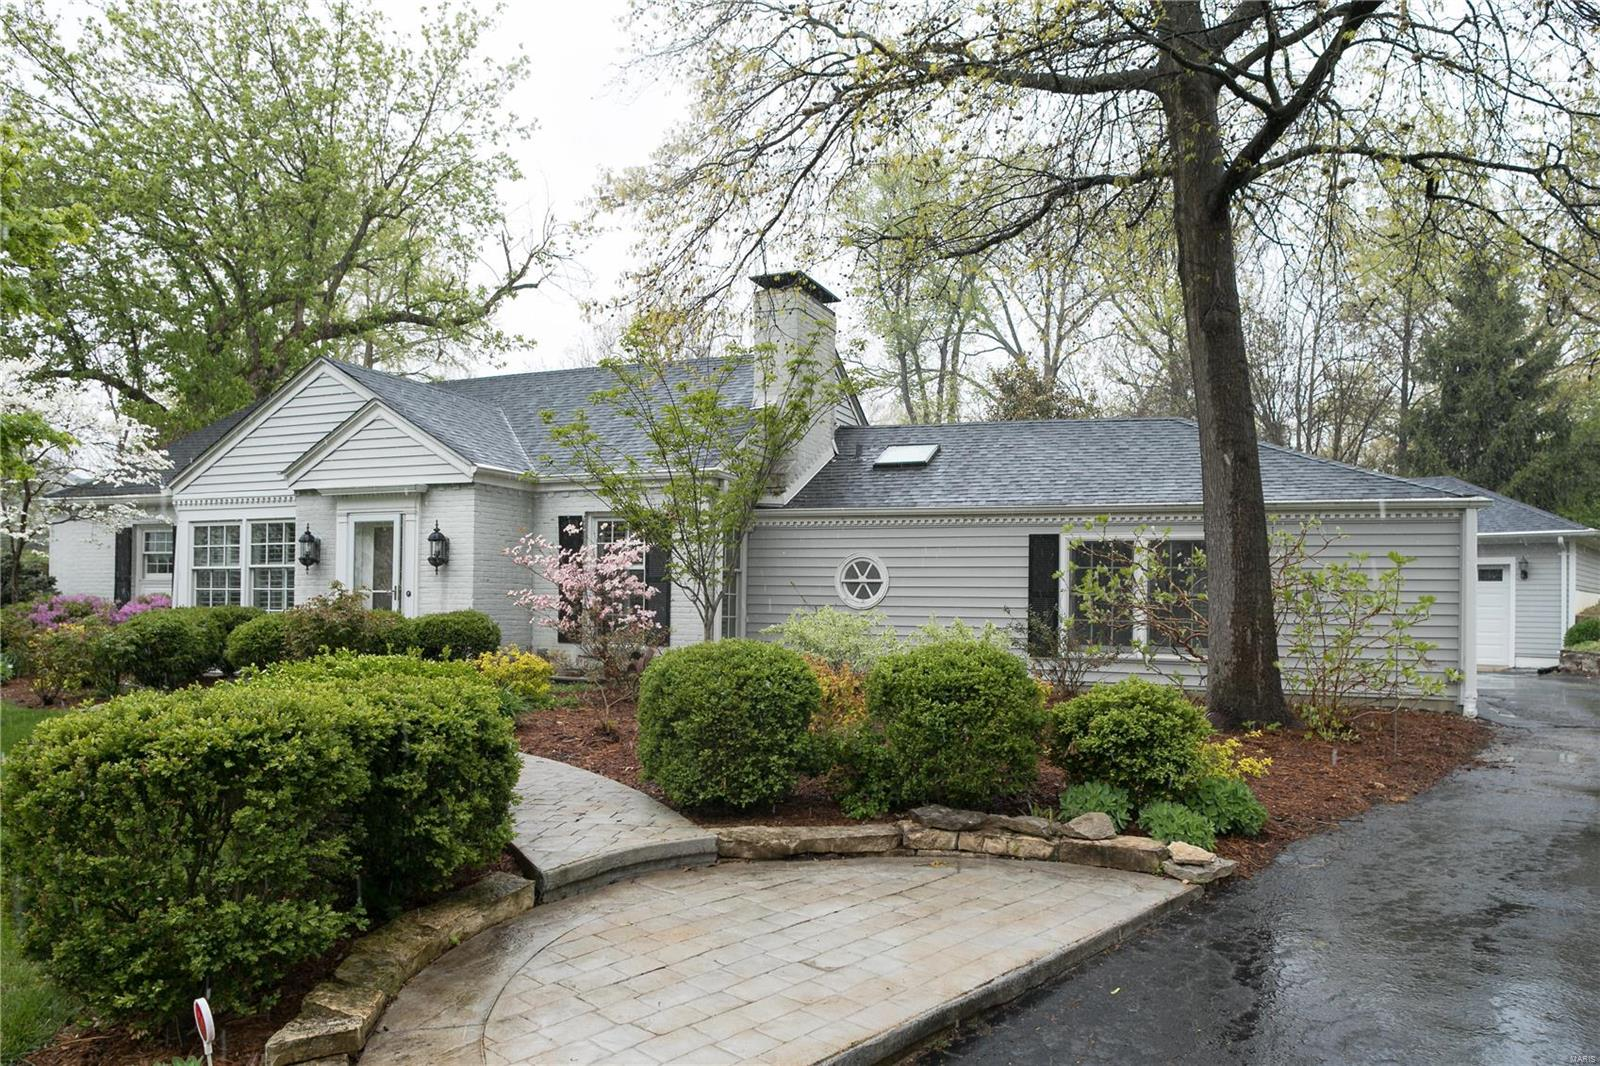 21 S Covington Meadow Property Photo - Olivette, MO real estate listing